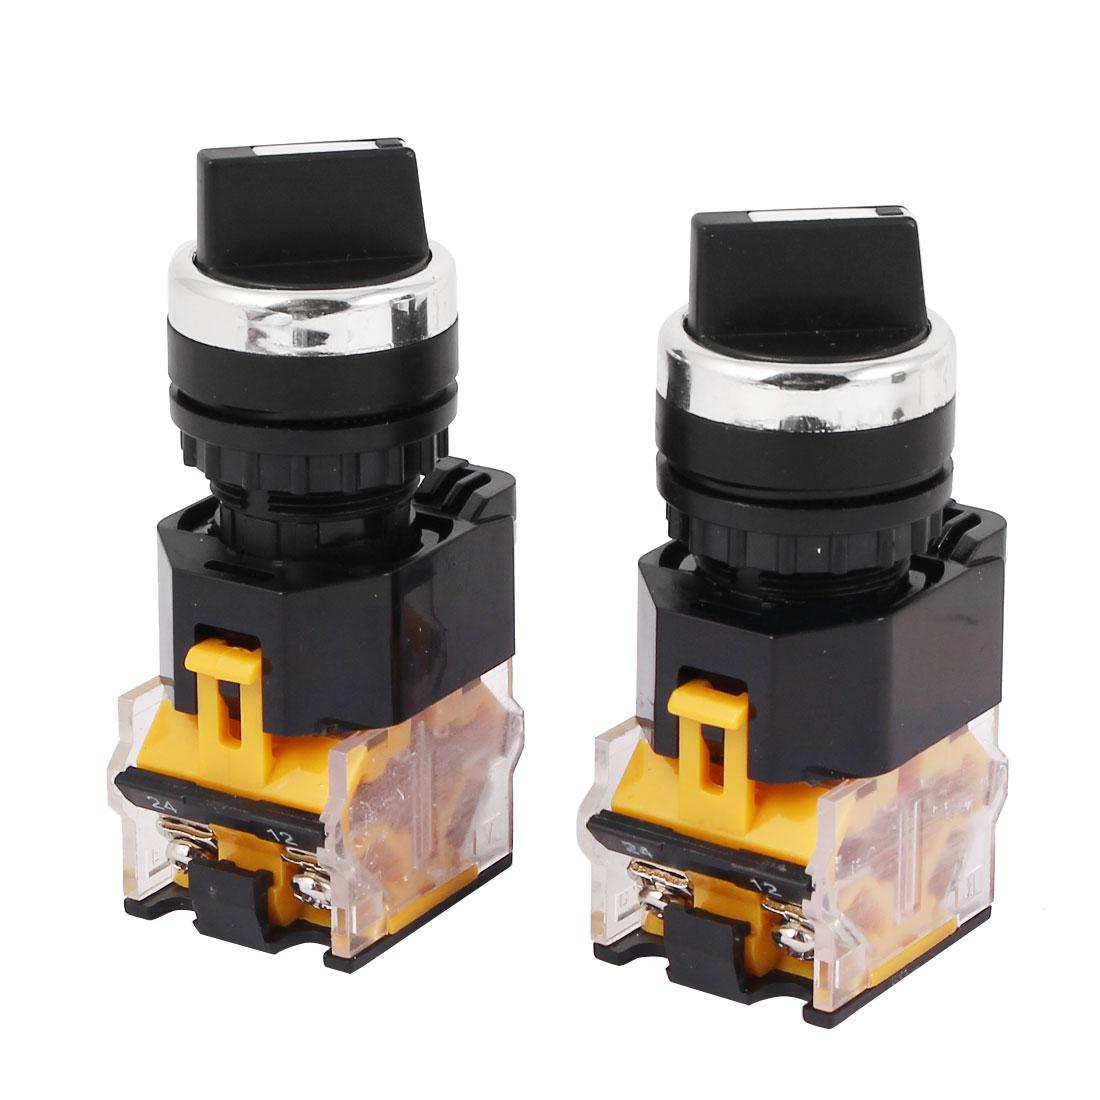 LA38-203 AC 400V 10A 2 Position ON/OFF Rotary Selector Switch Orange 2 Pcs